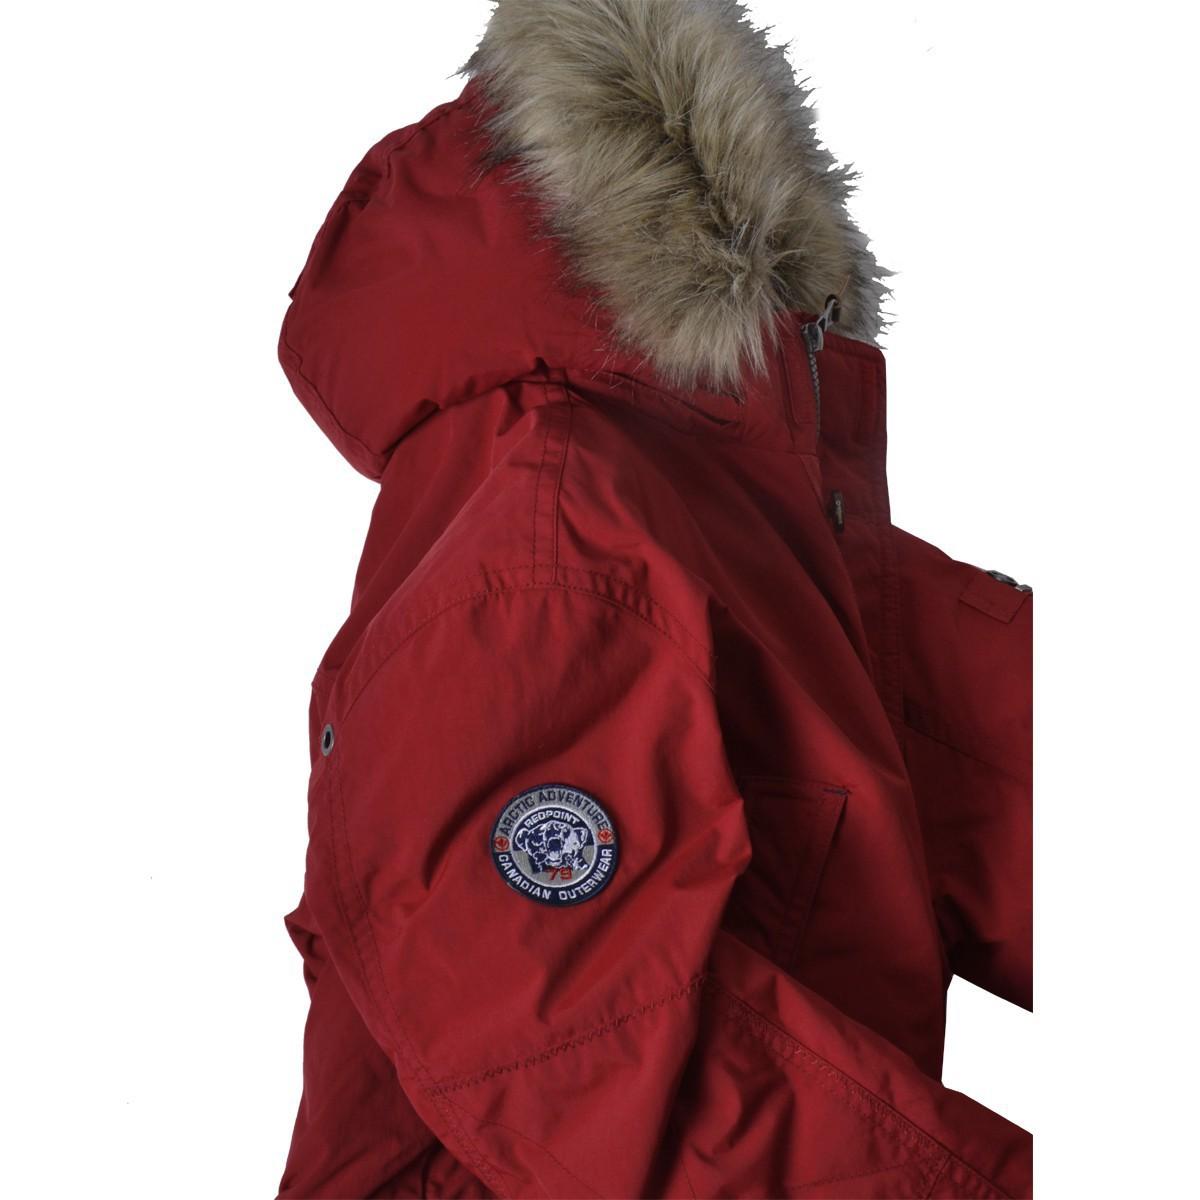 online store 08261 de404 Winter-Parka rot in Übergröße Redpoint